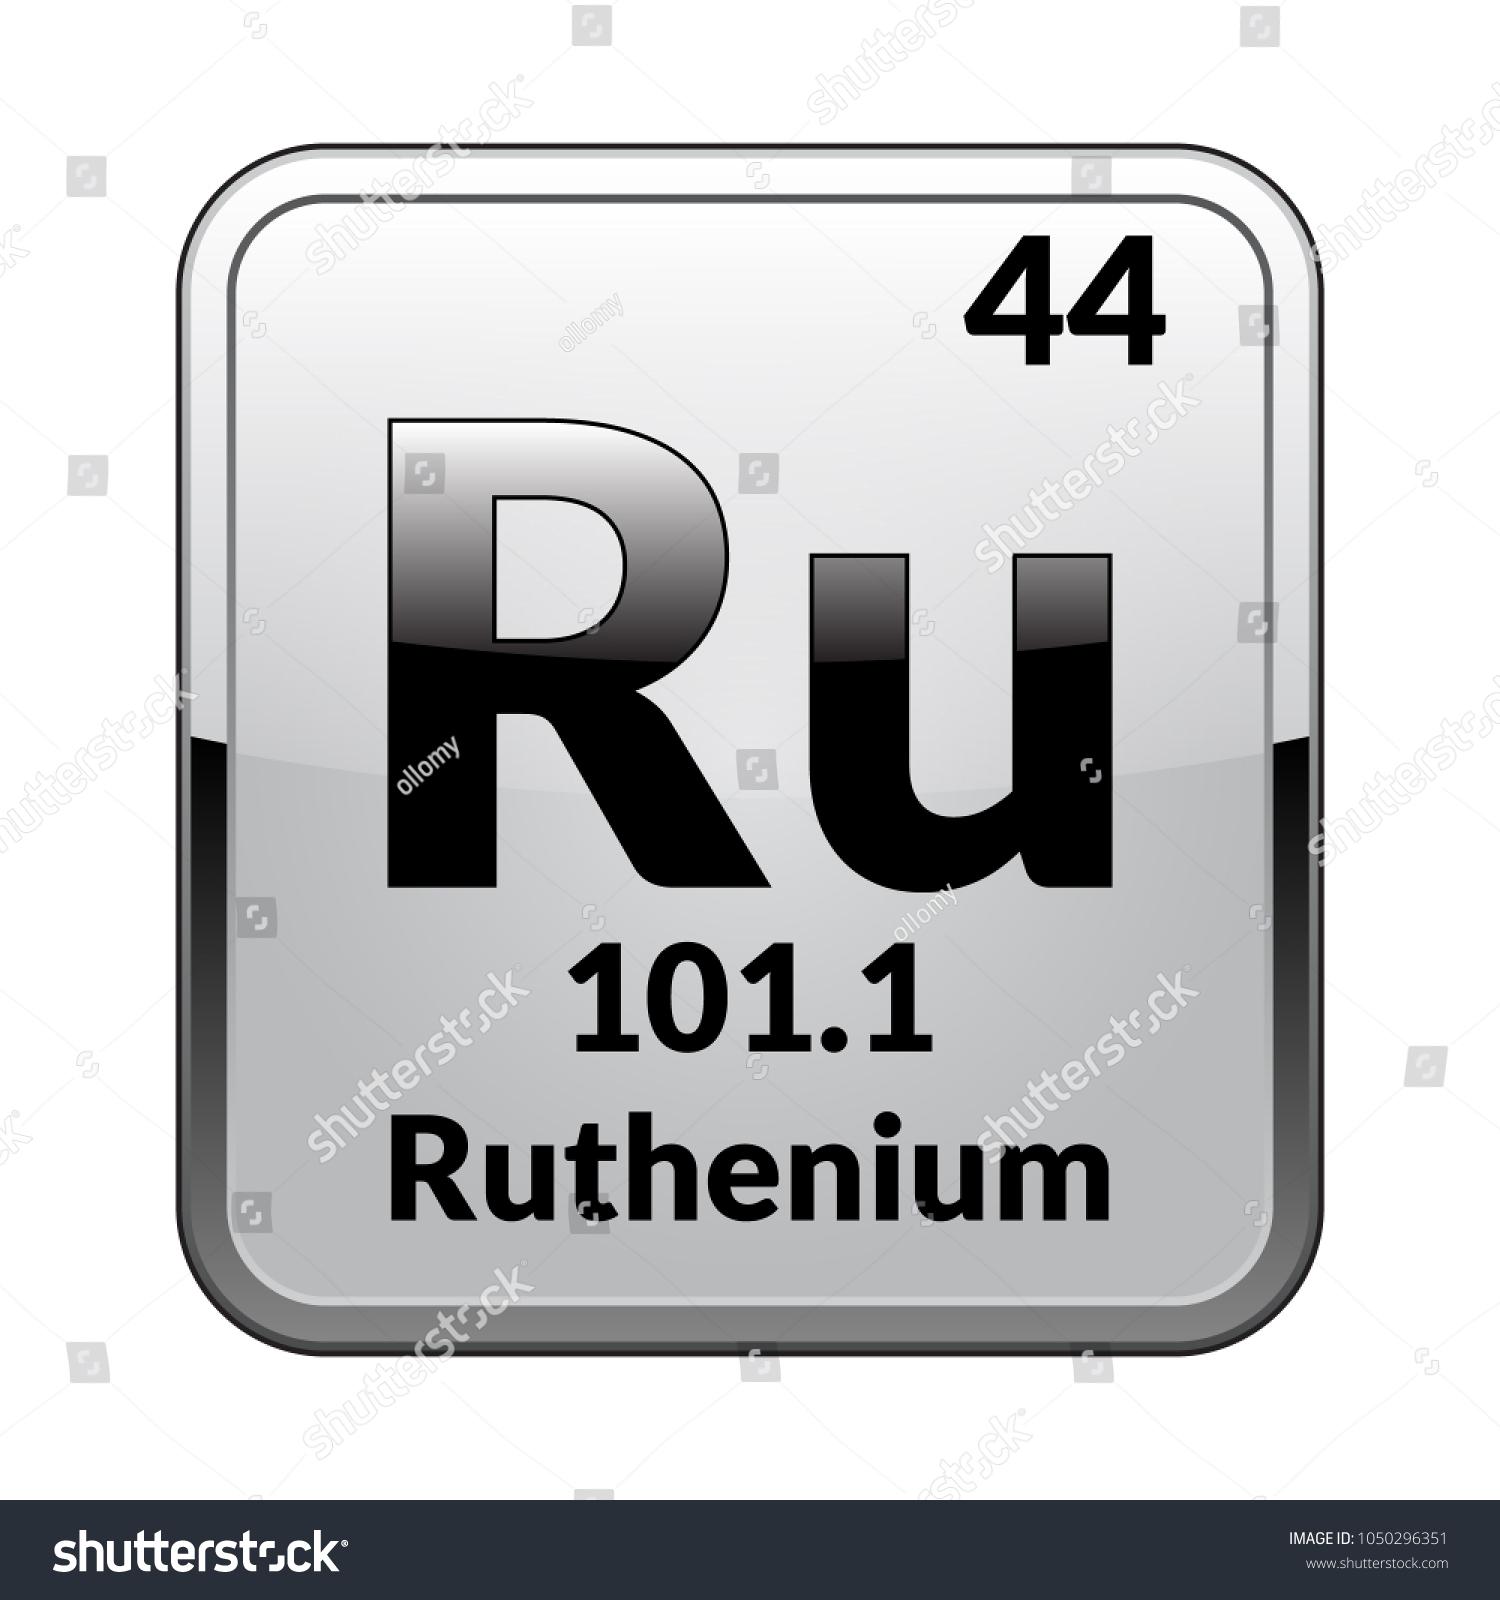 Ruthenium Symbol Chemical Element Periodic Table On Stock Vector